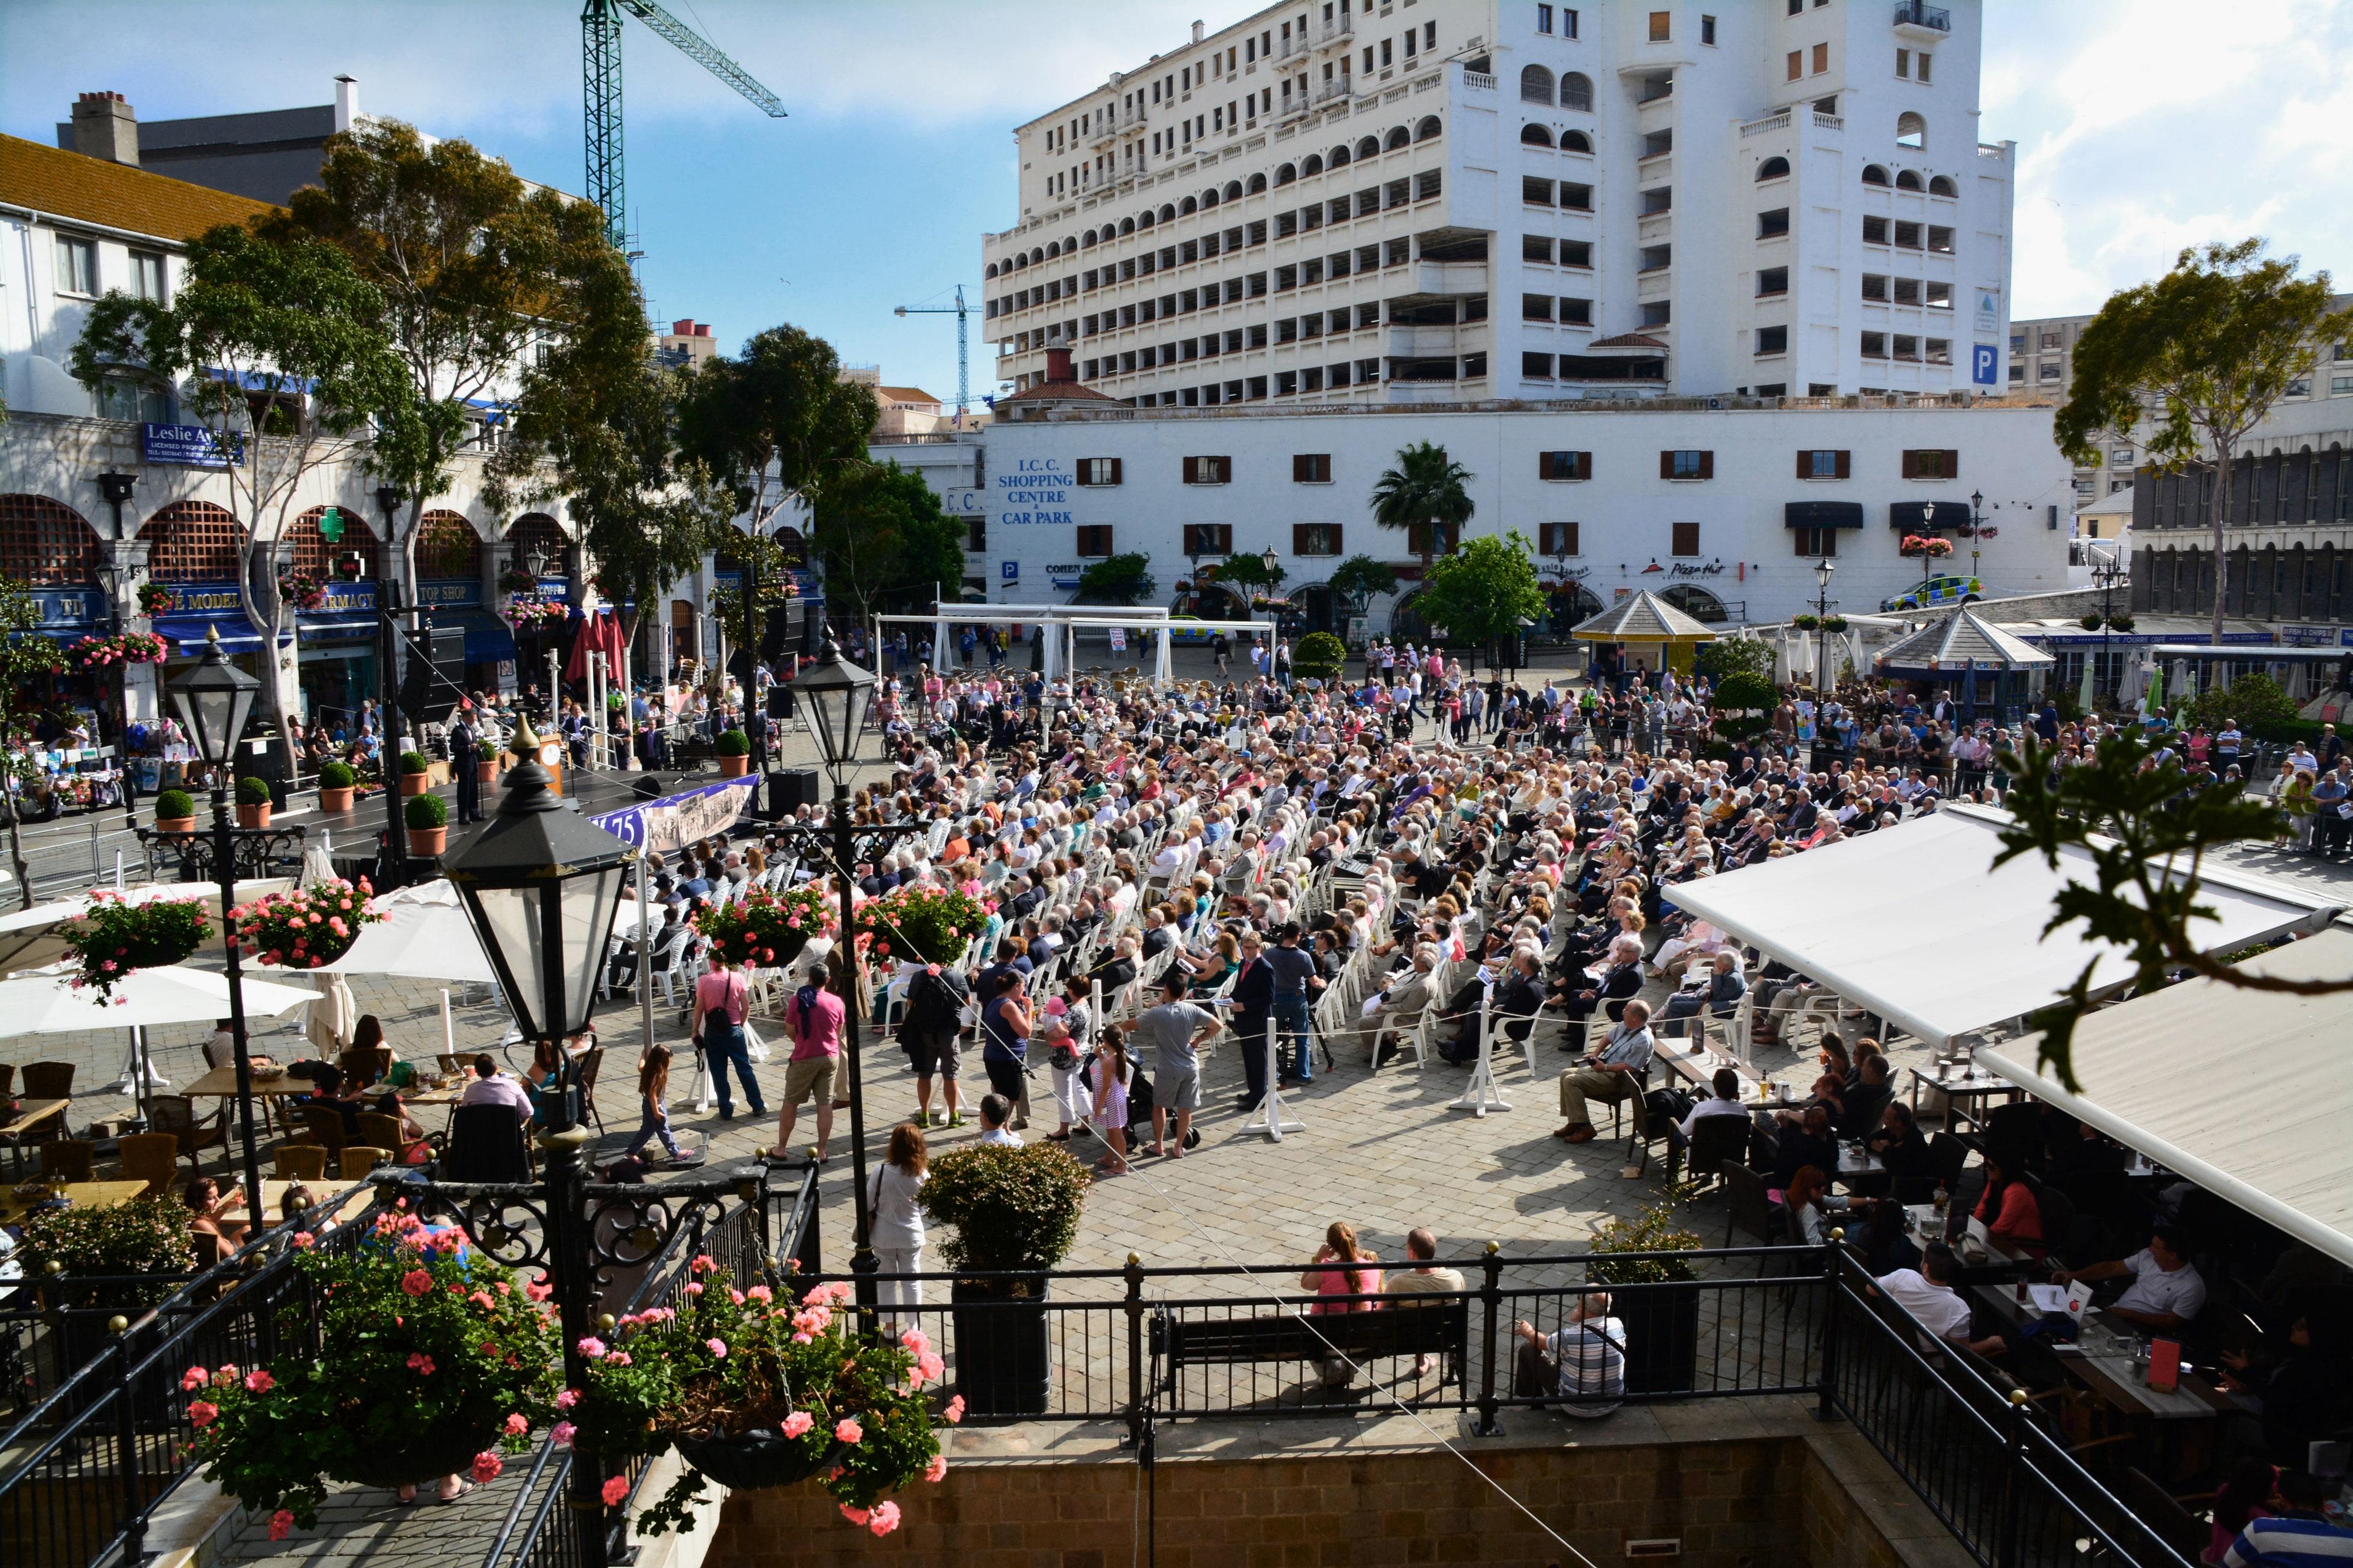 gibraltar-evacuation-dsc_3855_17977785736_o